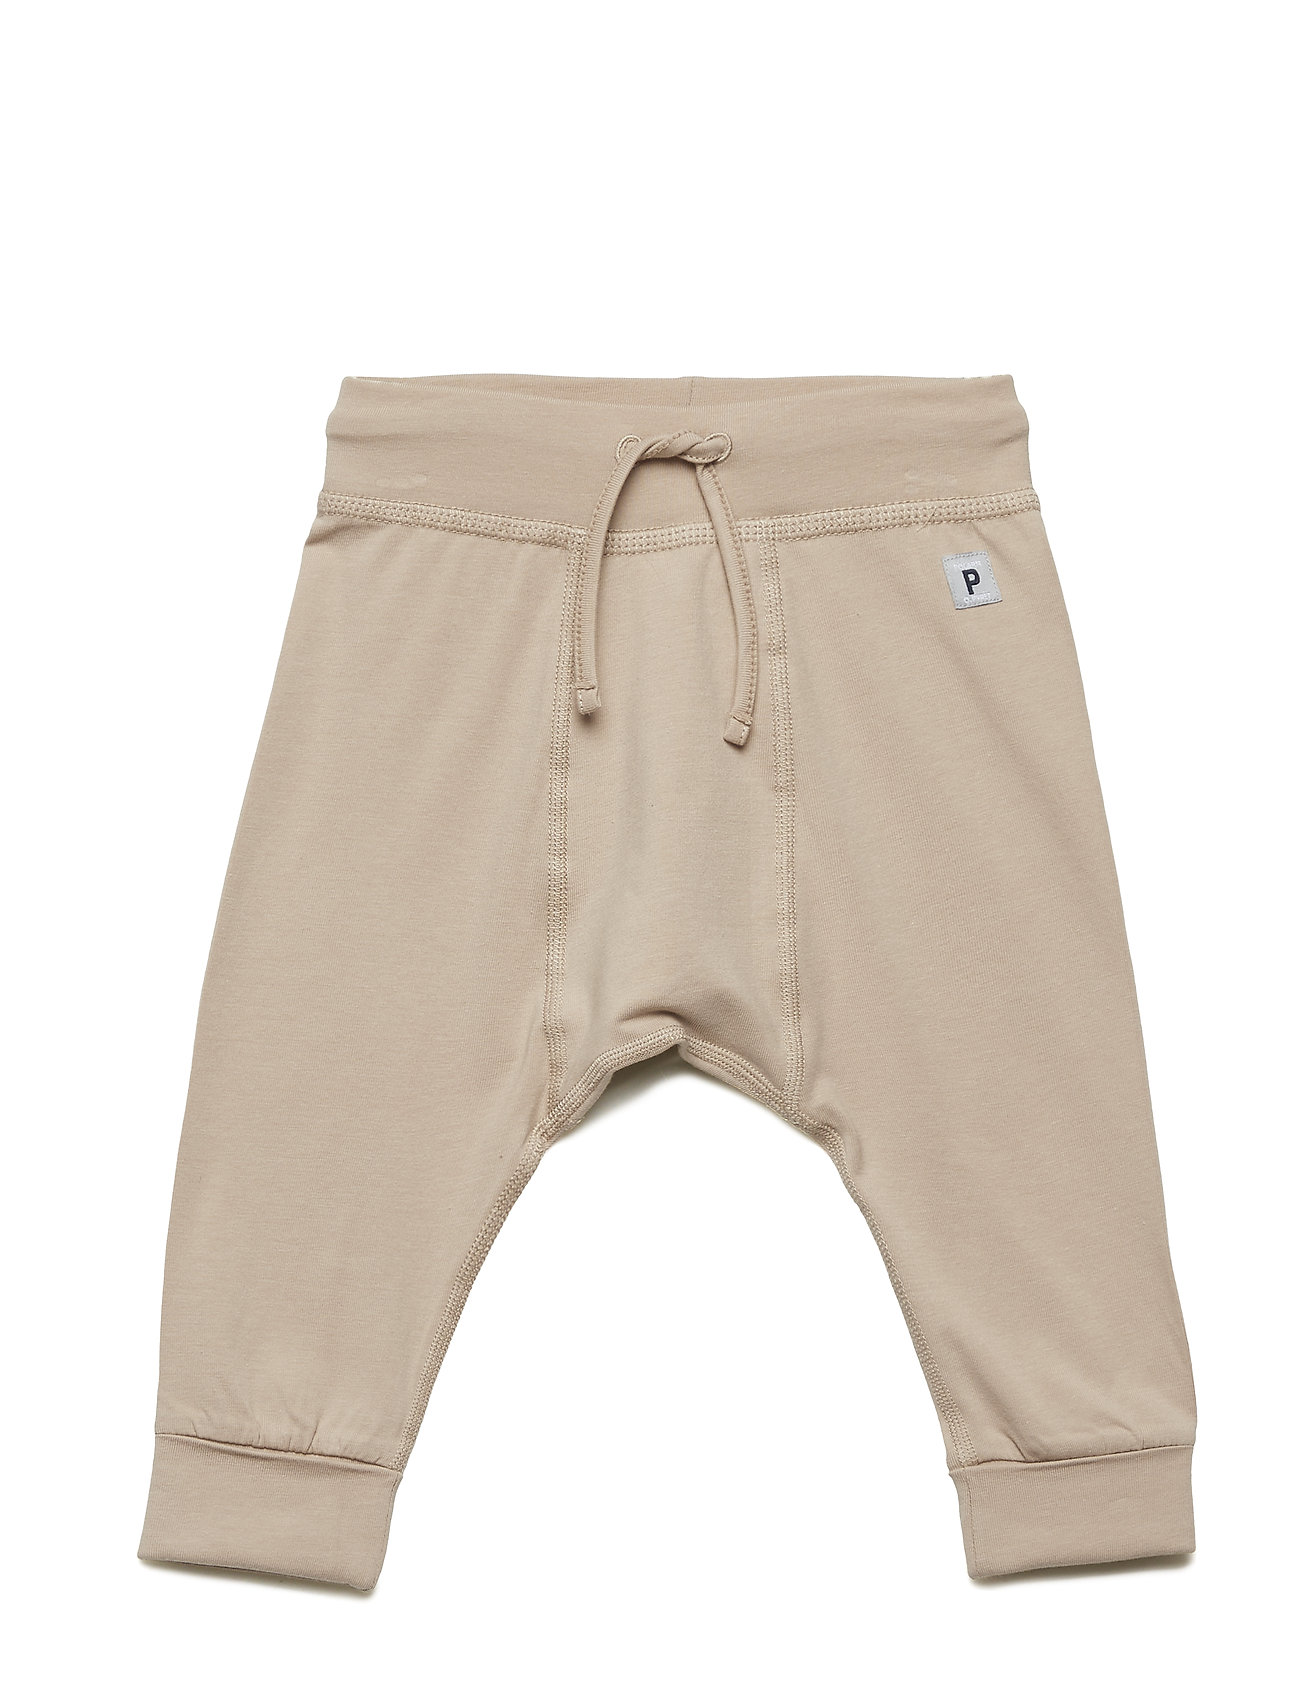 Polarn O. Pyret Trousers Solid Newborn